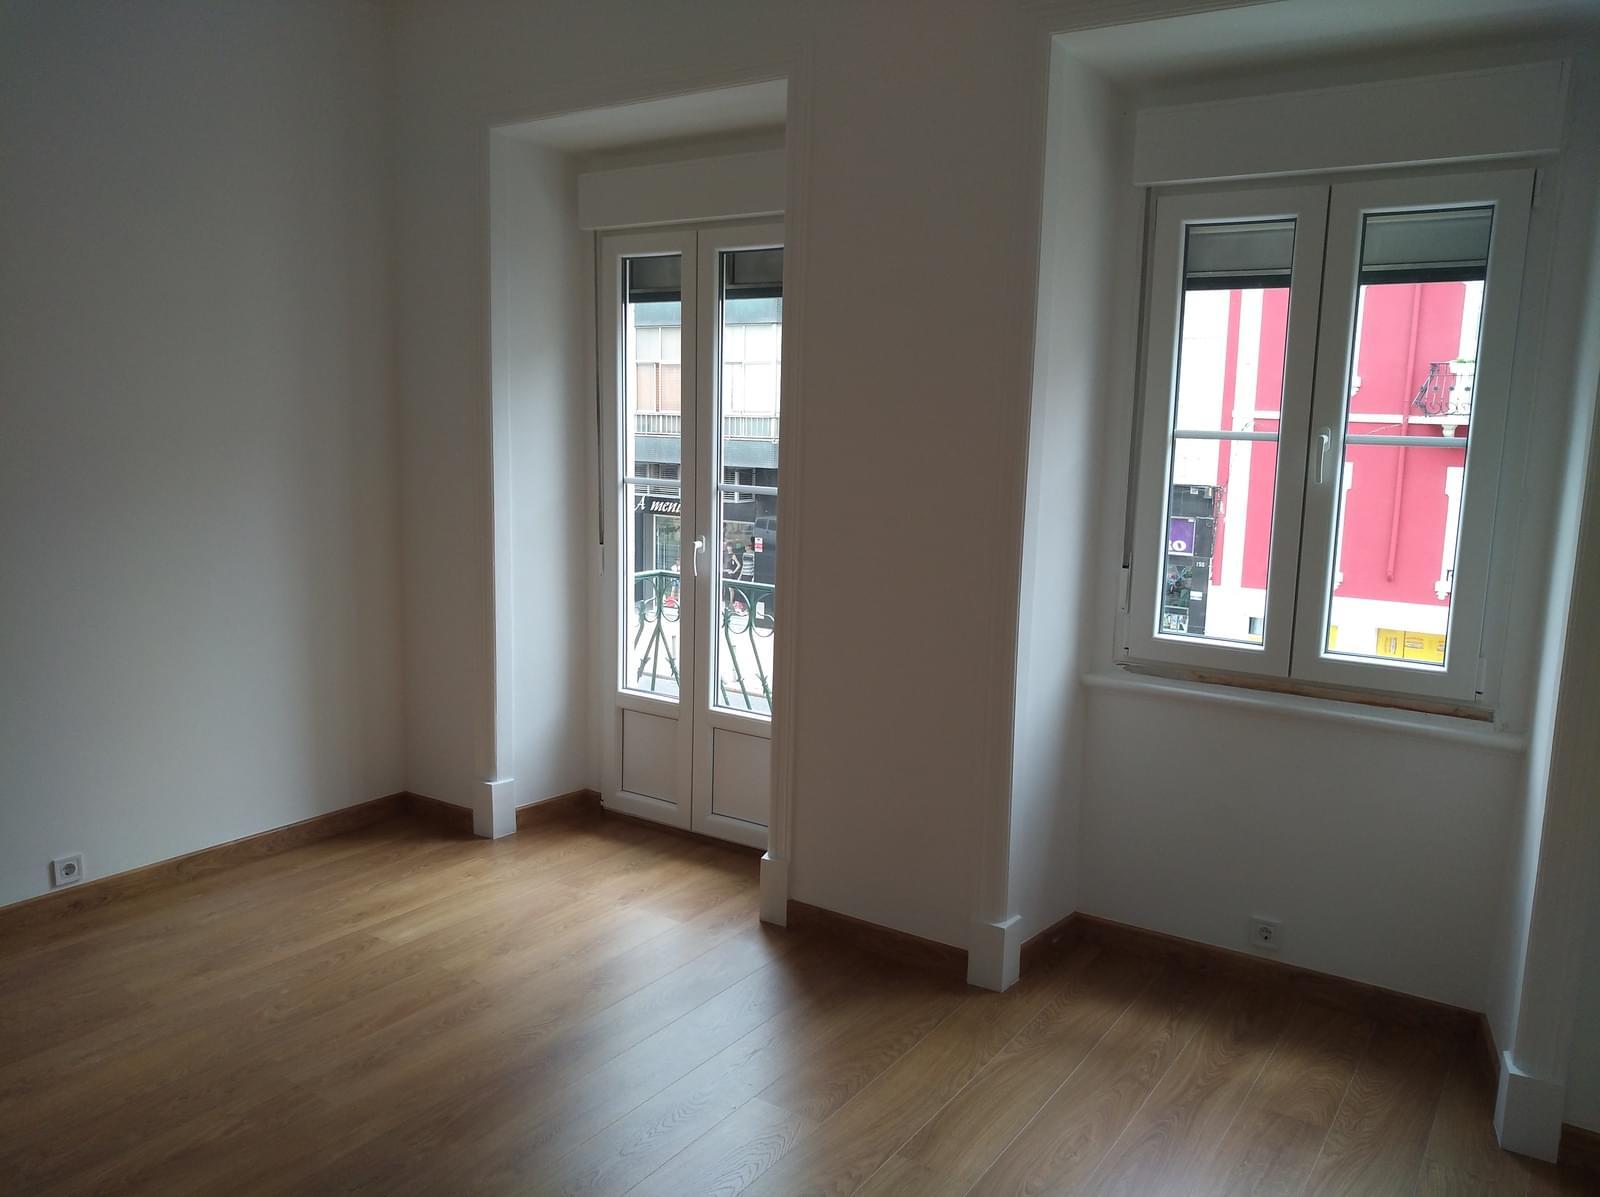 pf17316-apartamento-t2-lisboa-91d971ee-f78a-4d2f-86da-bd18b885e5b9